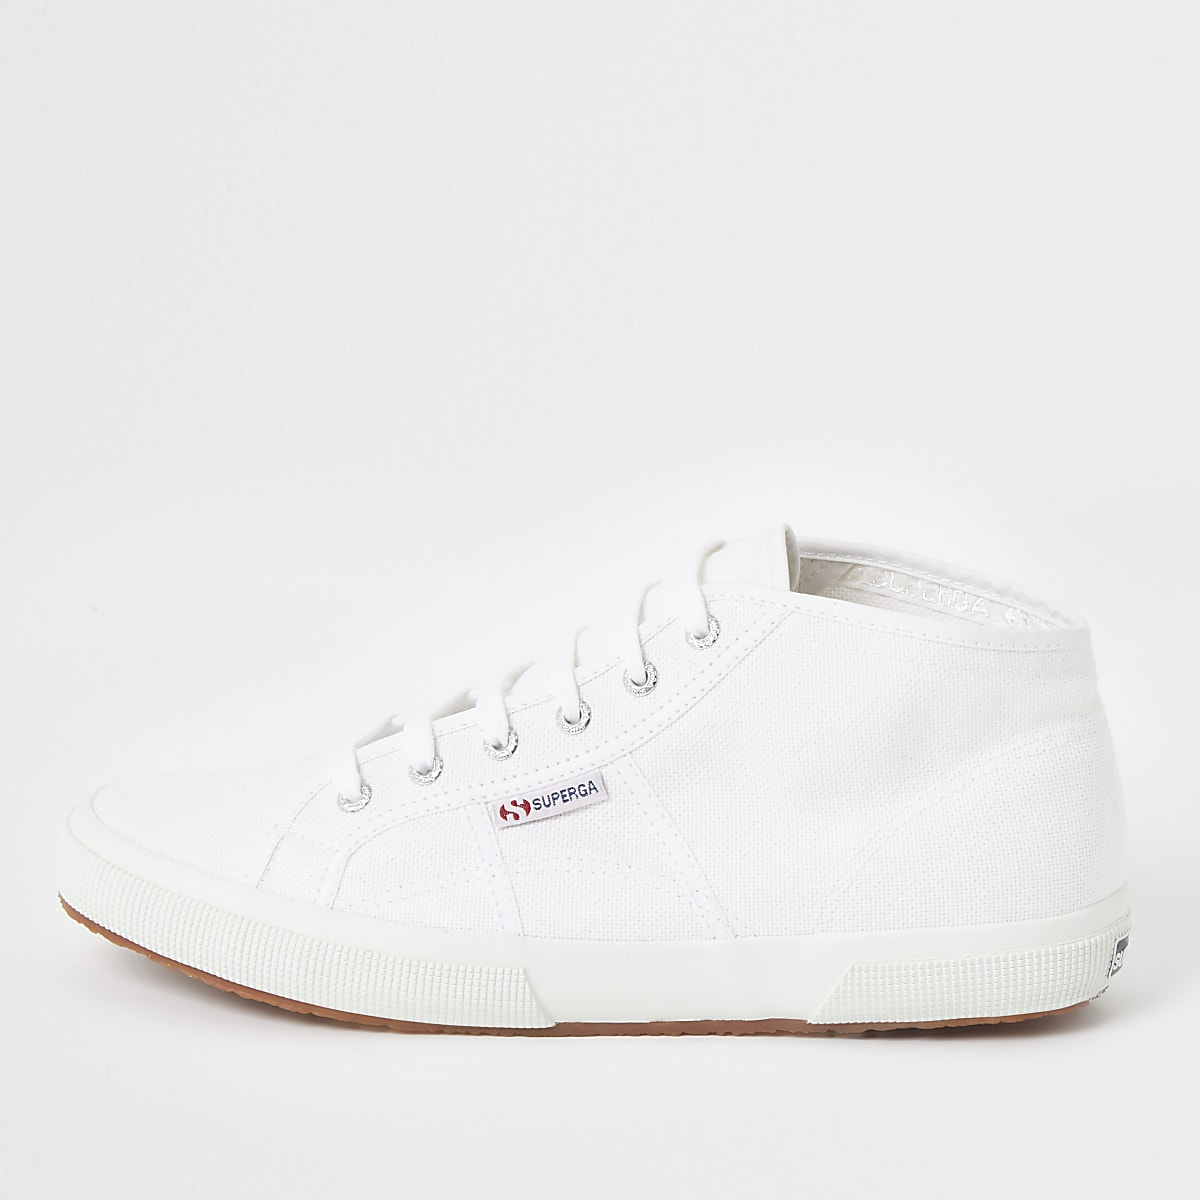 Superga – Baskets mi-hautes classiques blanches